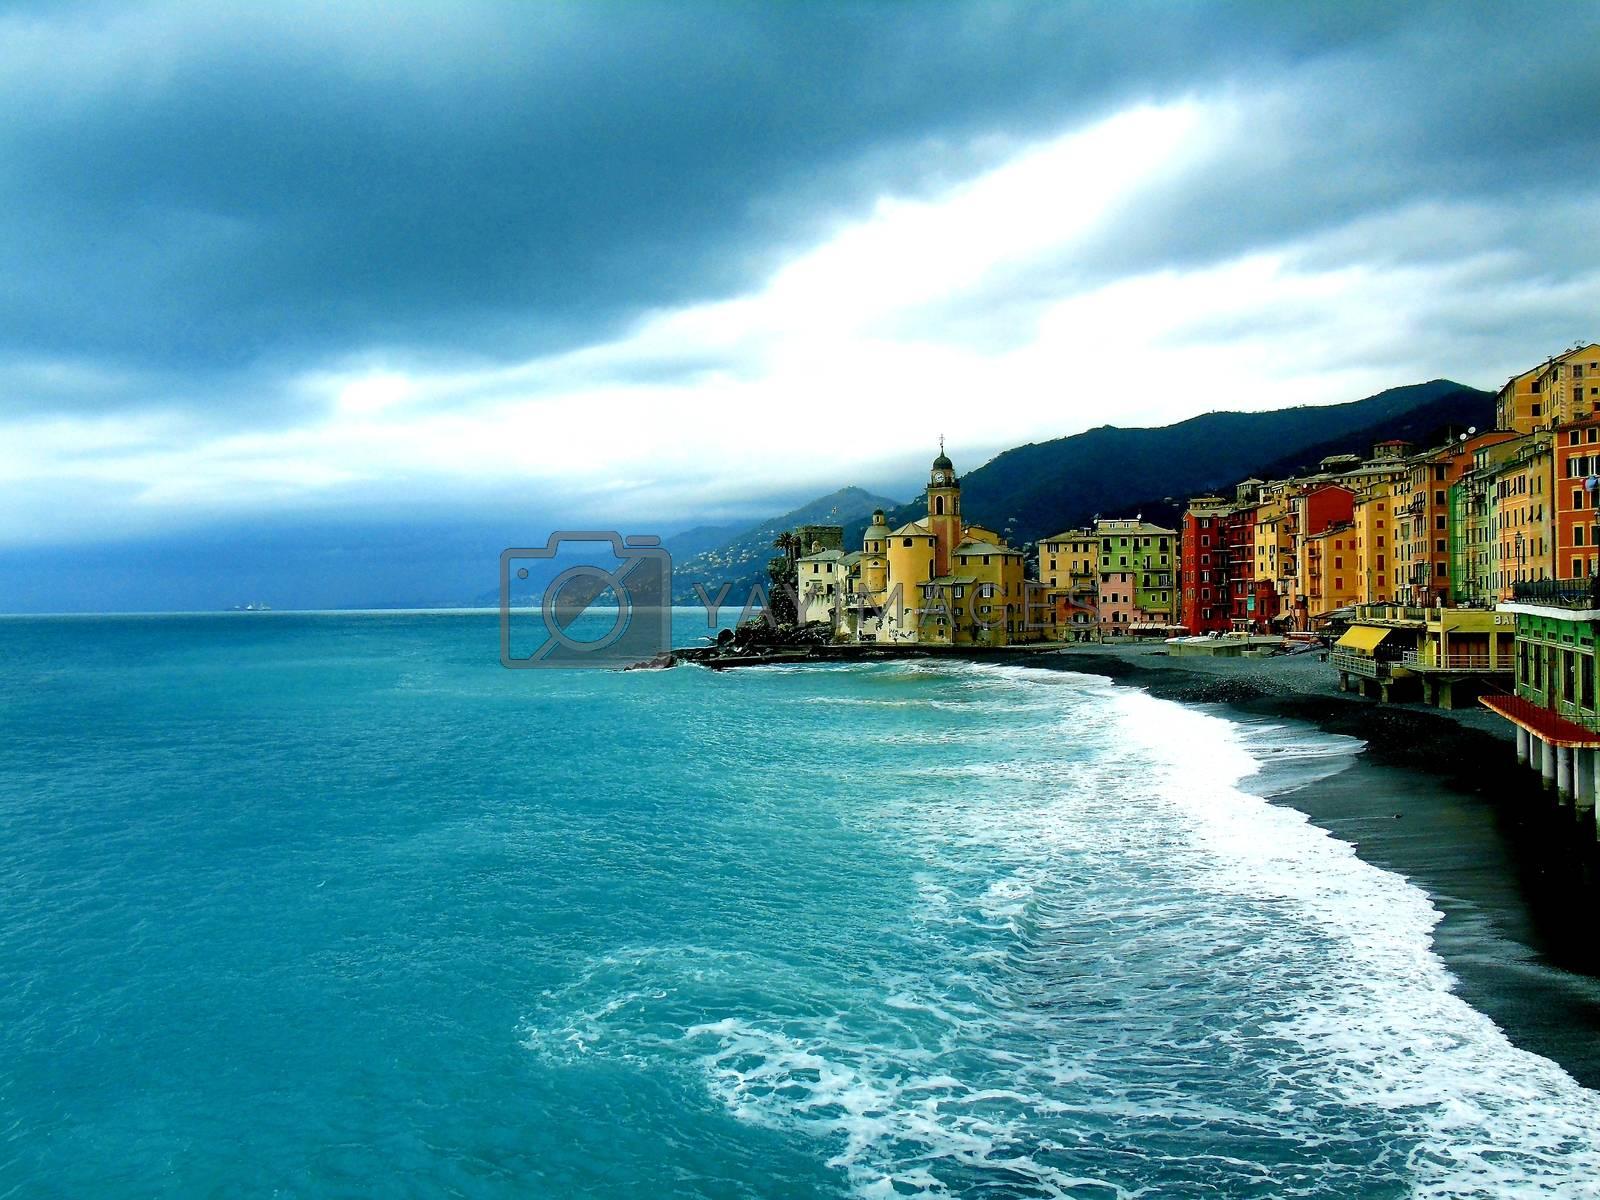 Ligurian riviera from Camogli to Portofino by yohananegusse